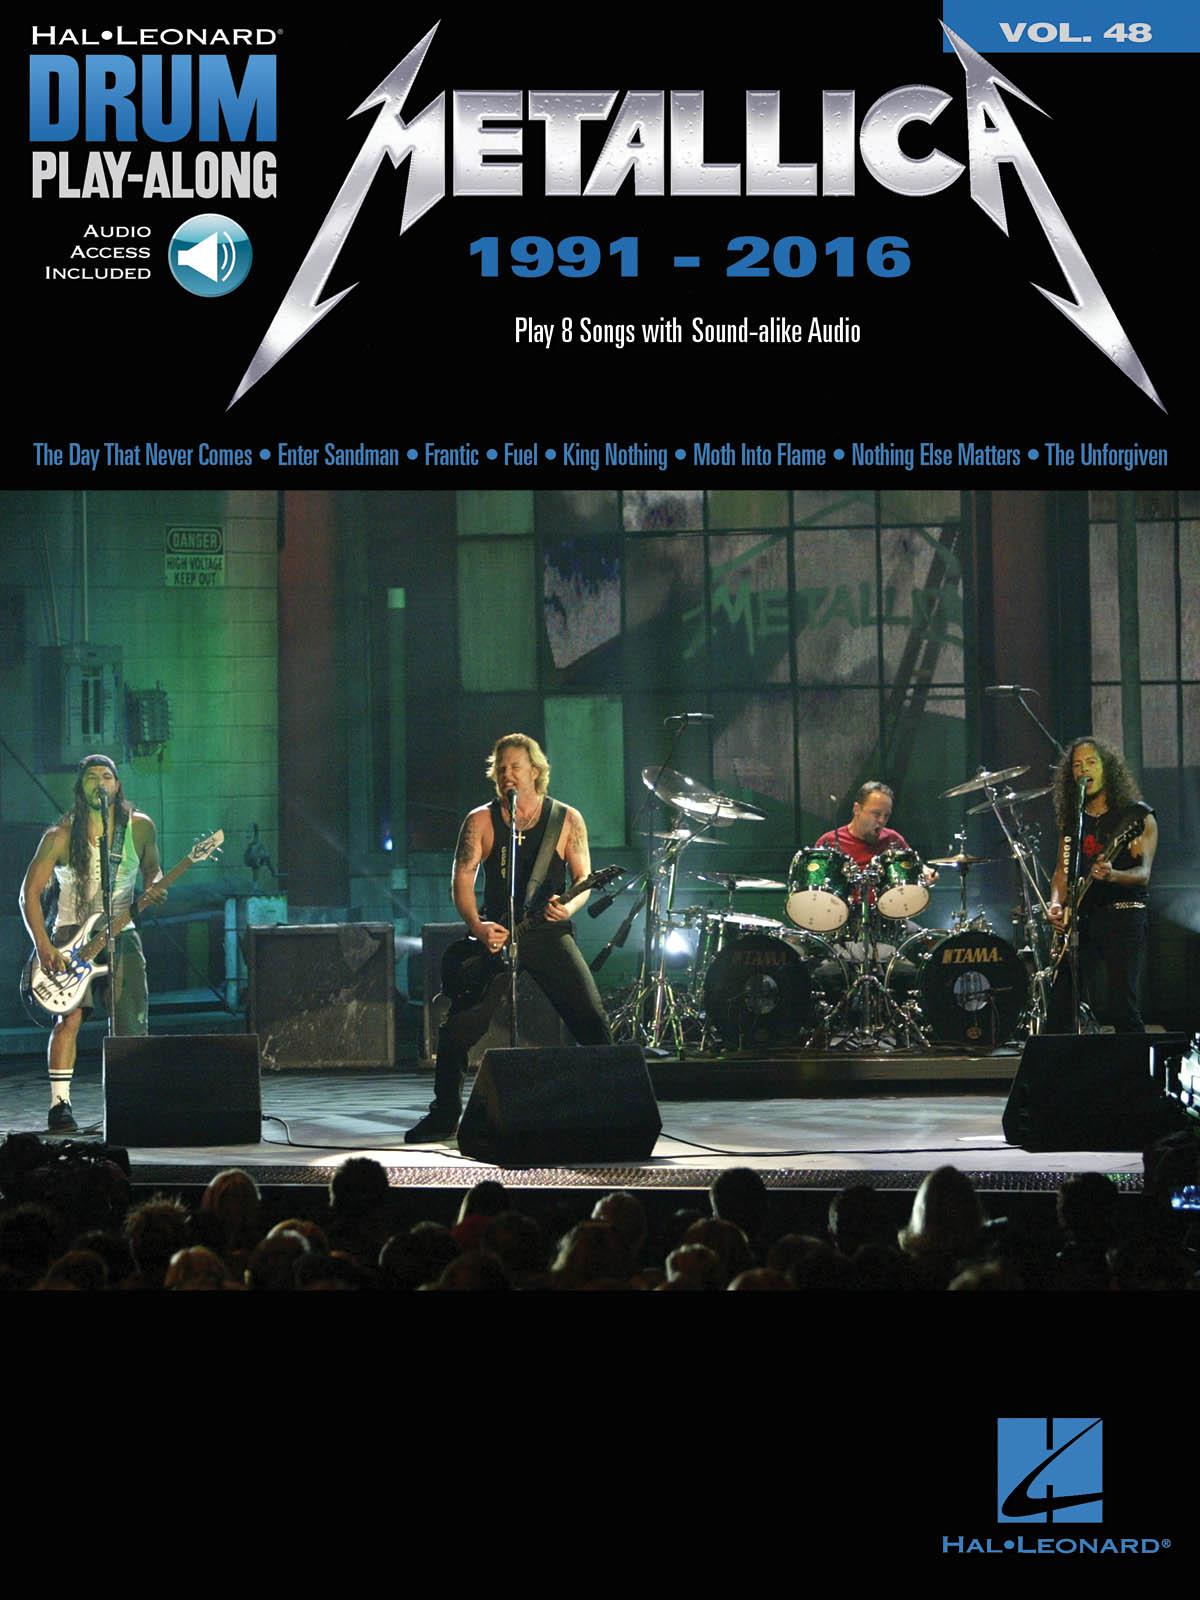 1991-2016 Play-Along Vol.48